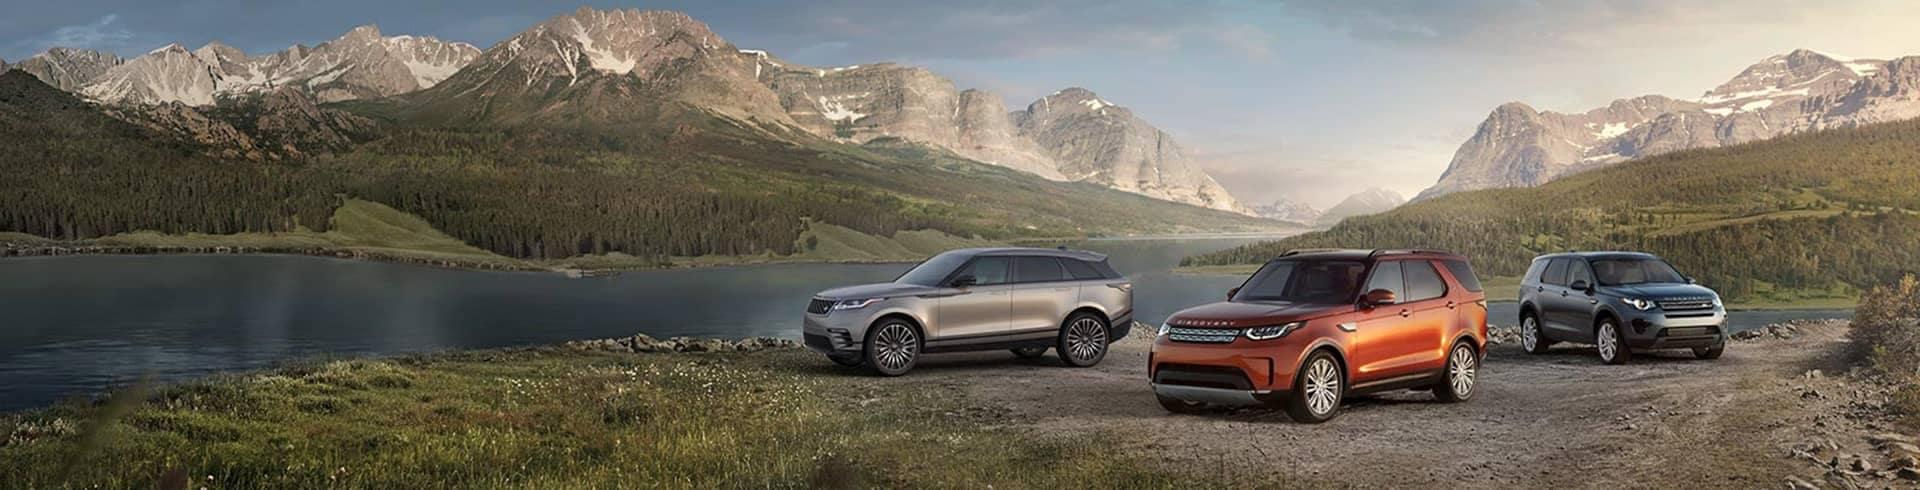 2019 Land Rovers near a mountain lake